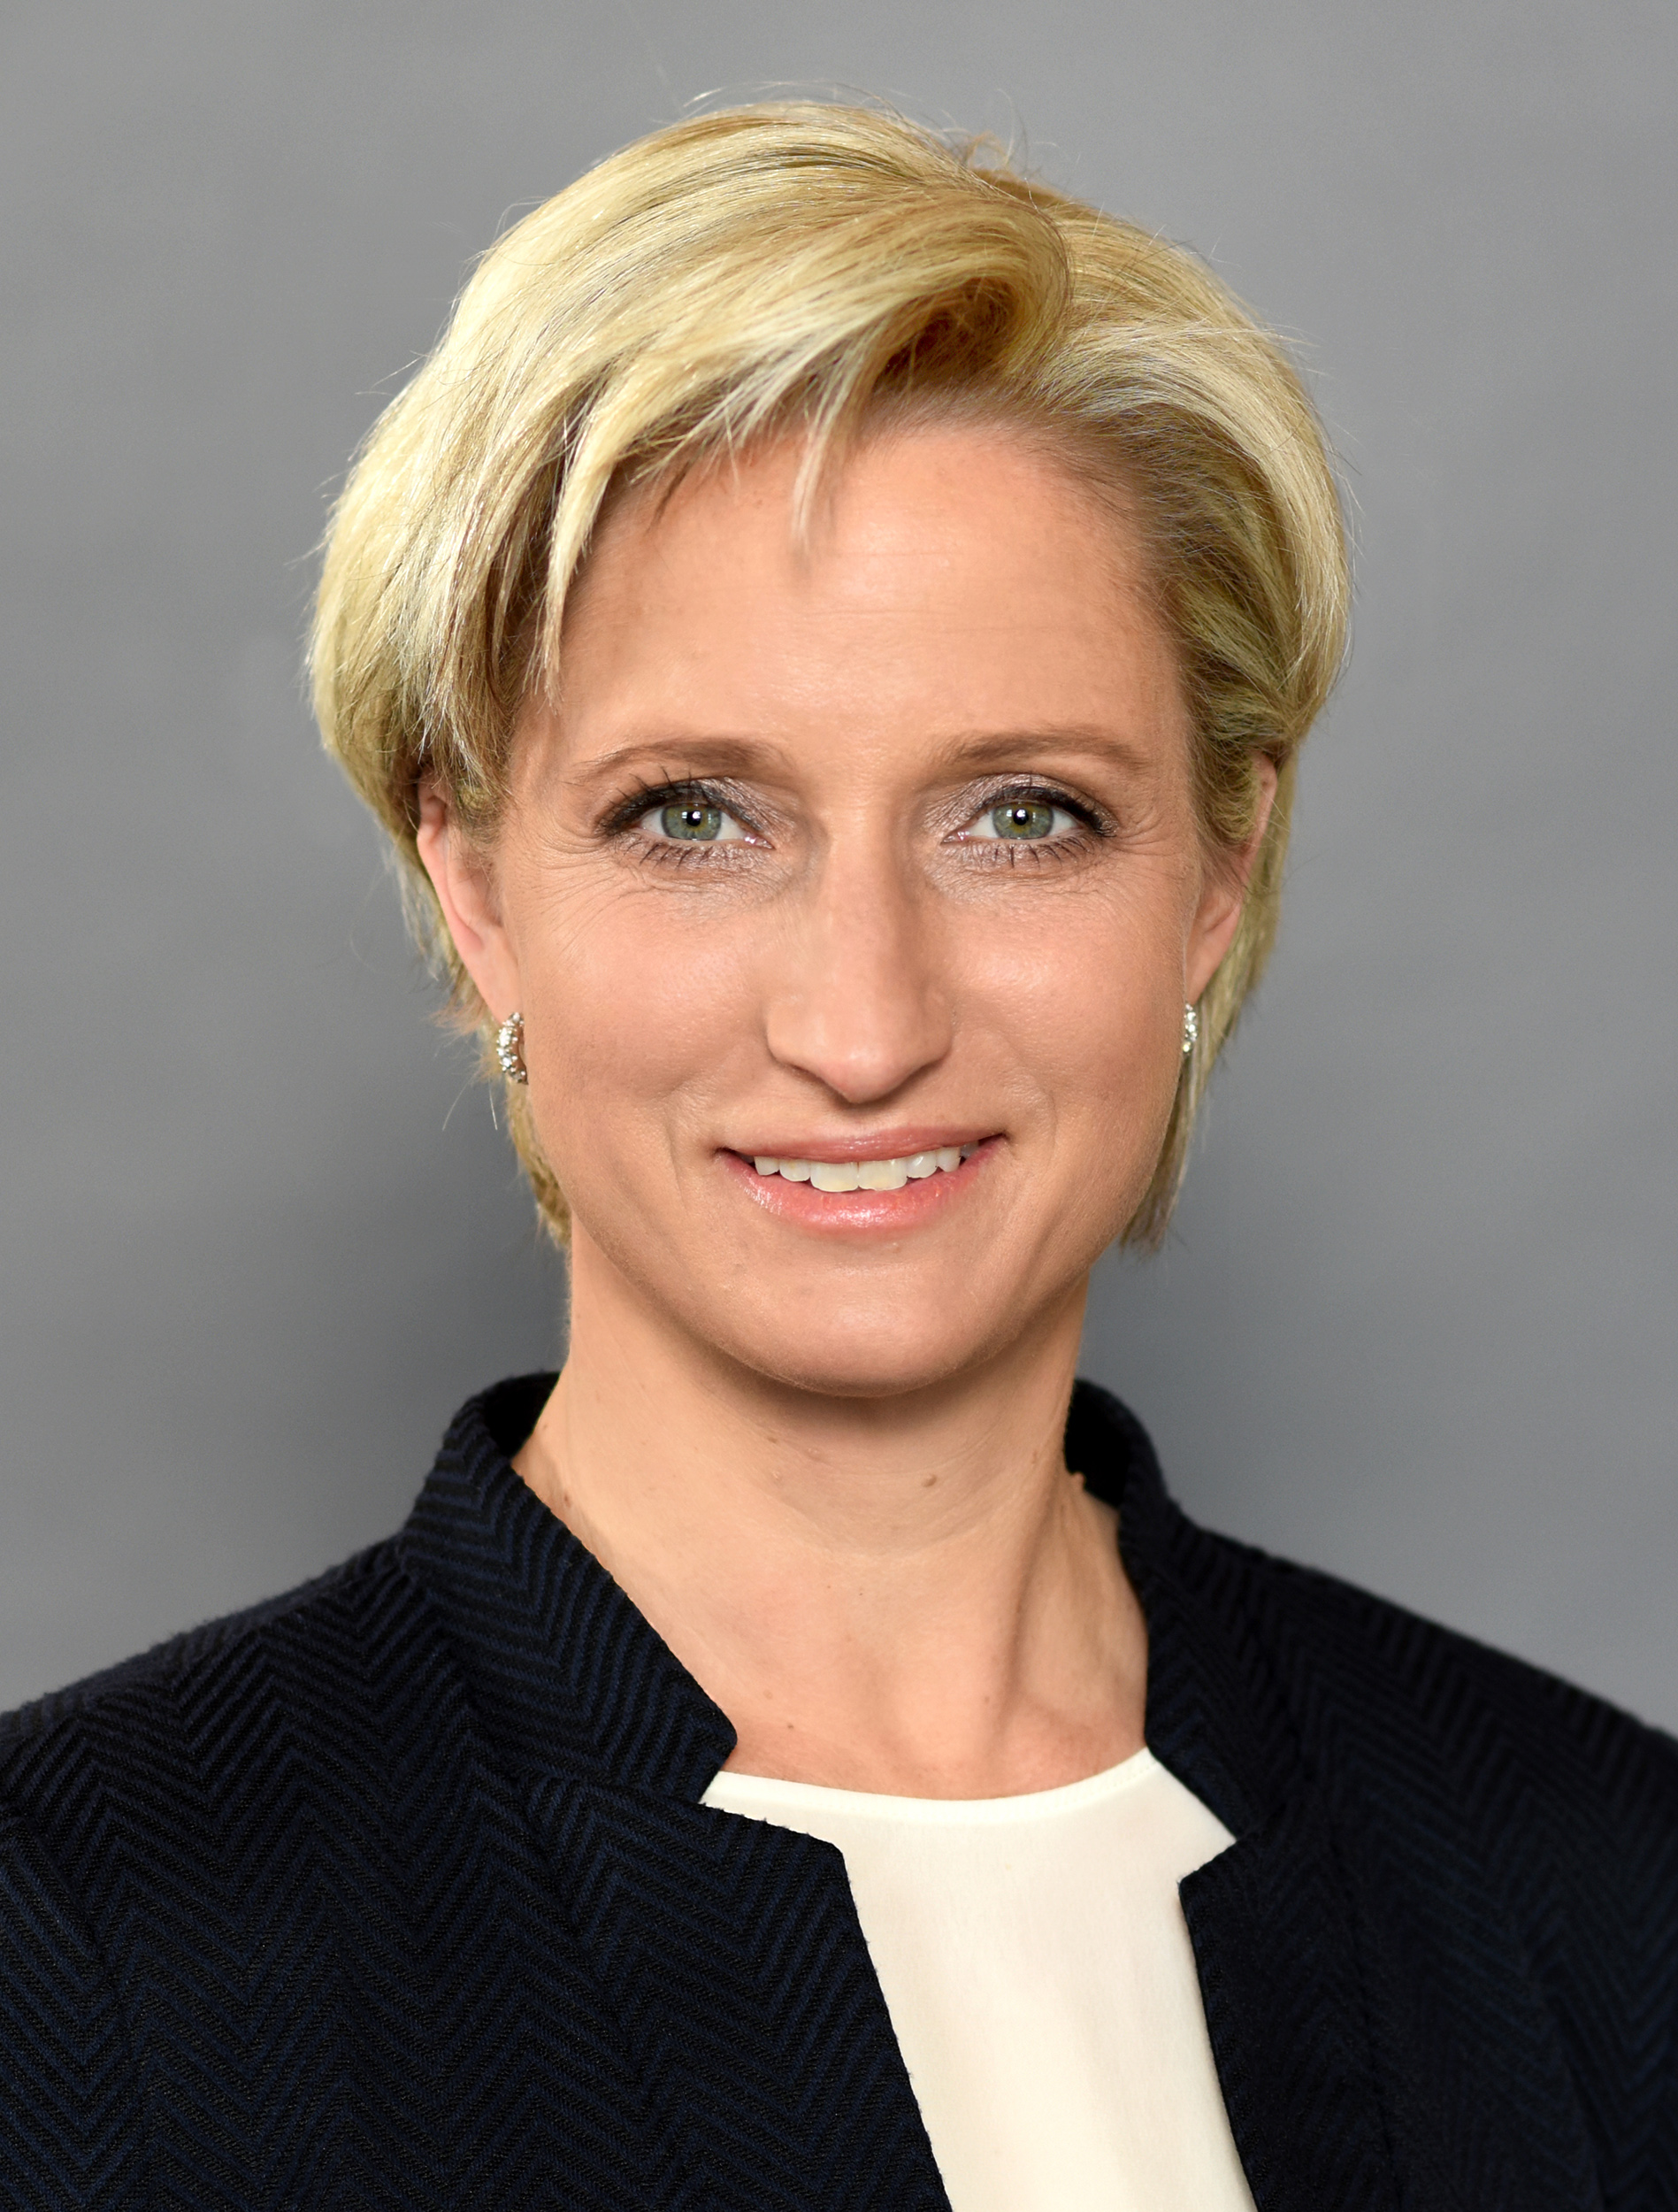 Ministerin Dr. <b>Nicole Hoffmeister-Kraut</b> - Hoffmeister-Kraut_2